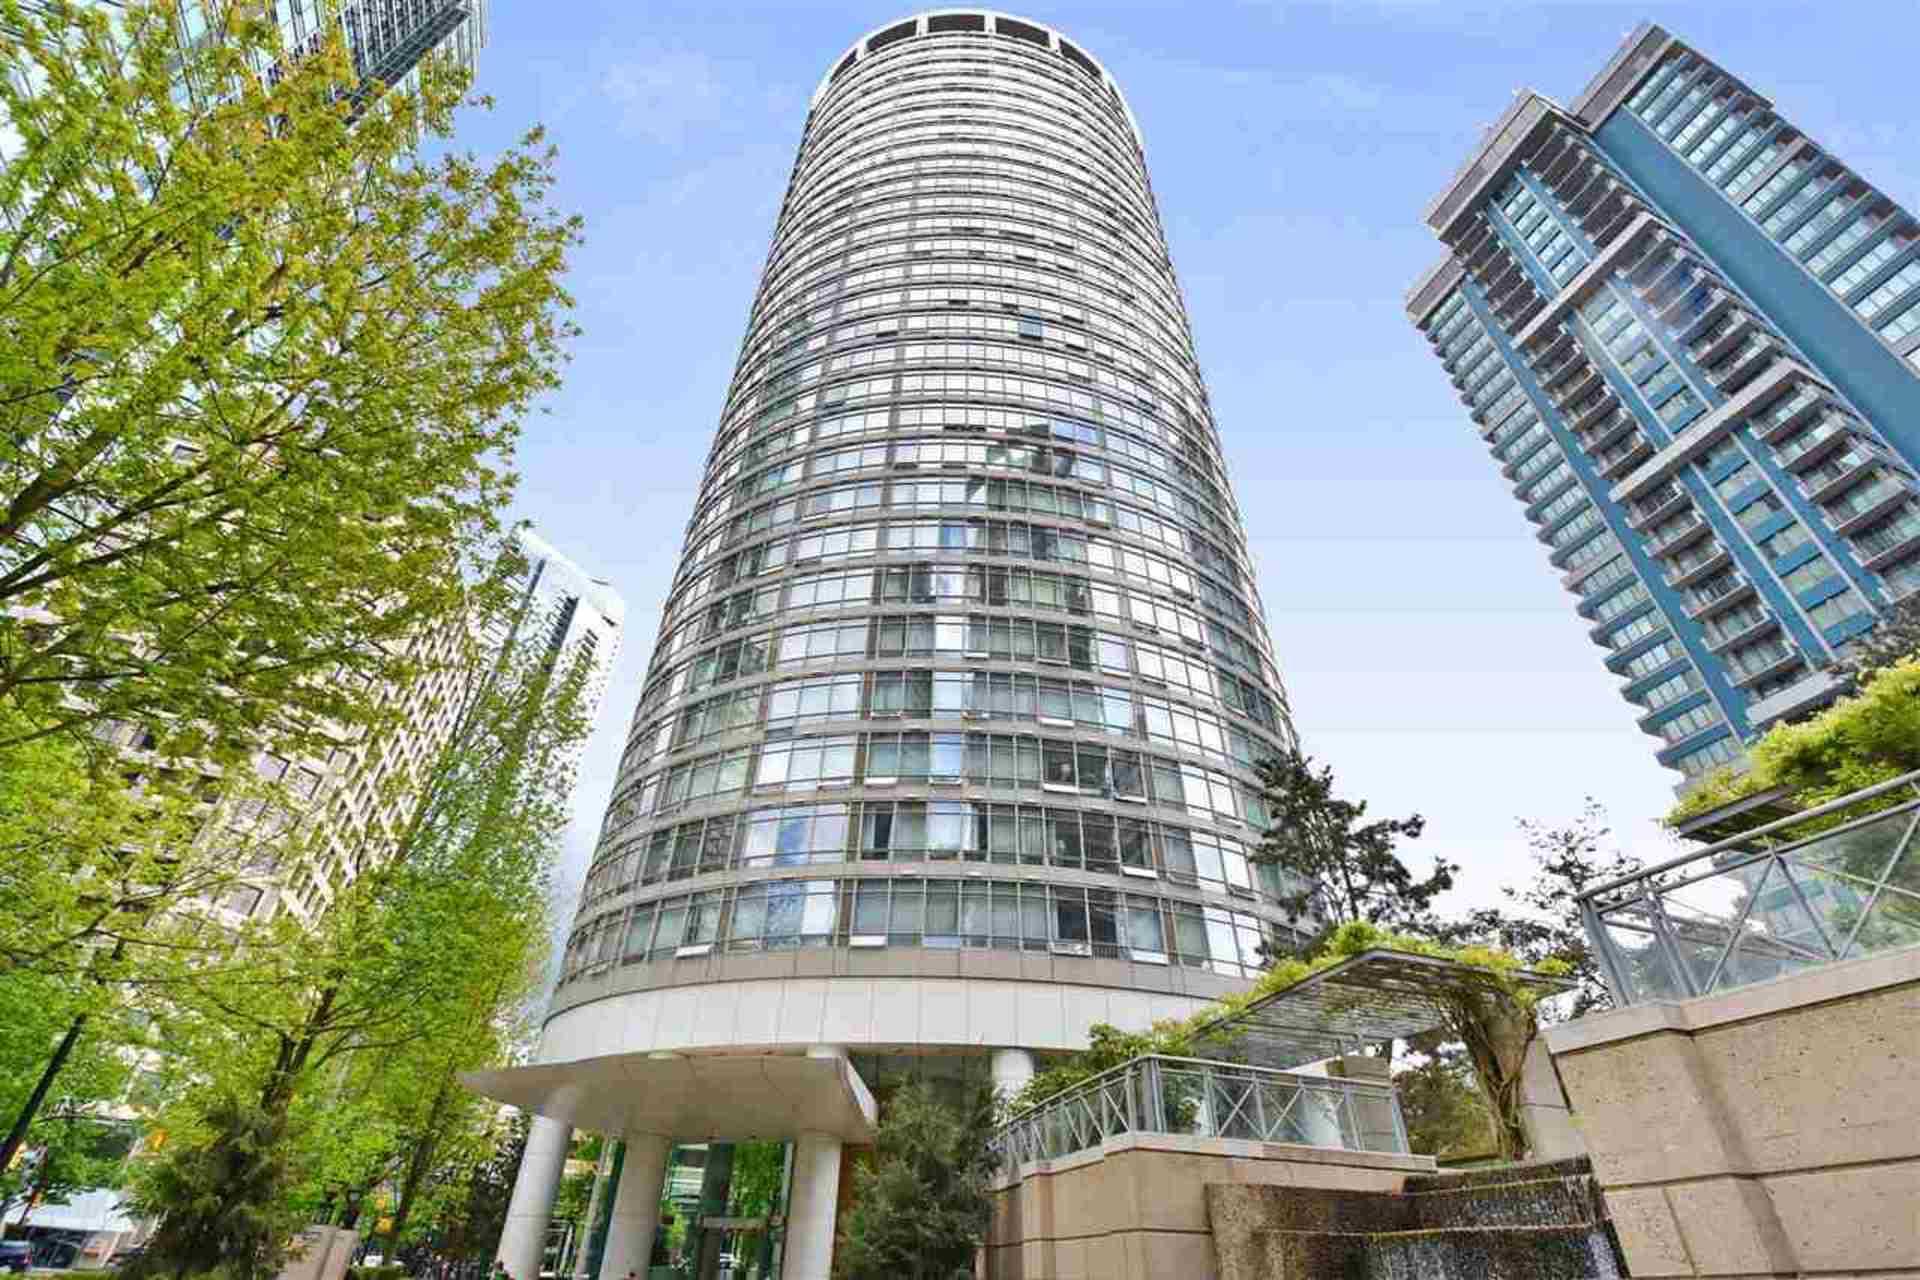 1200-alberni-street-west-end-vw-vancouver-west-02 at 2202 - 1200 Alberni Street, West End VW, Vancouver West